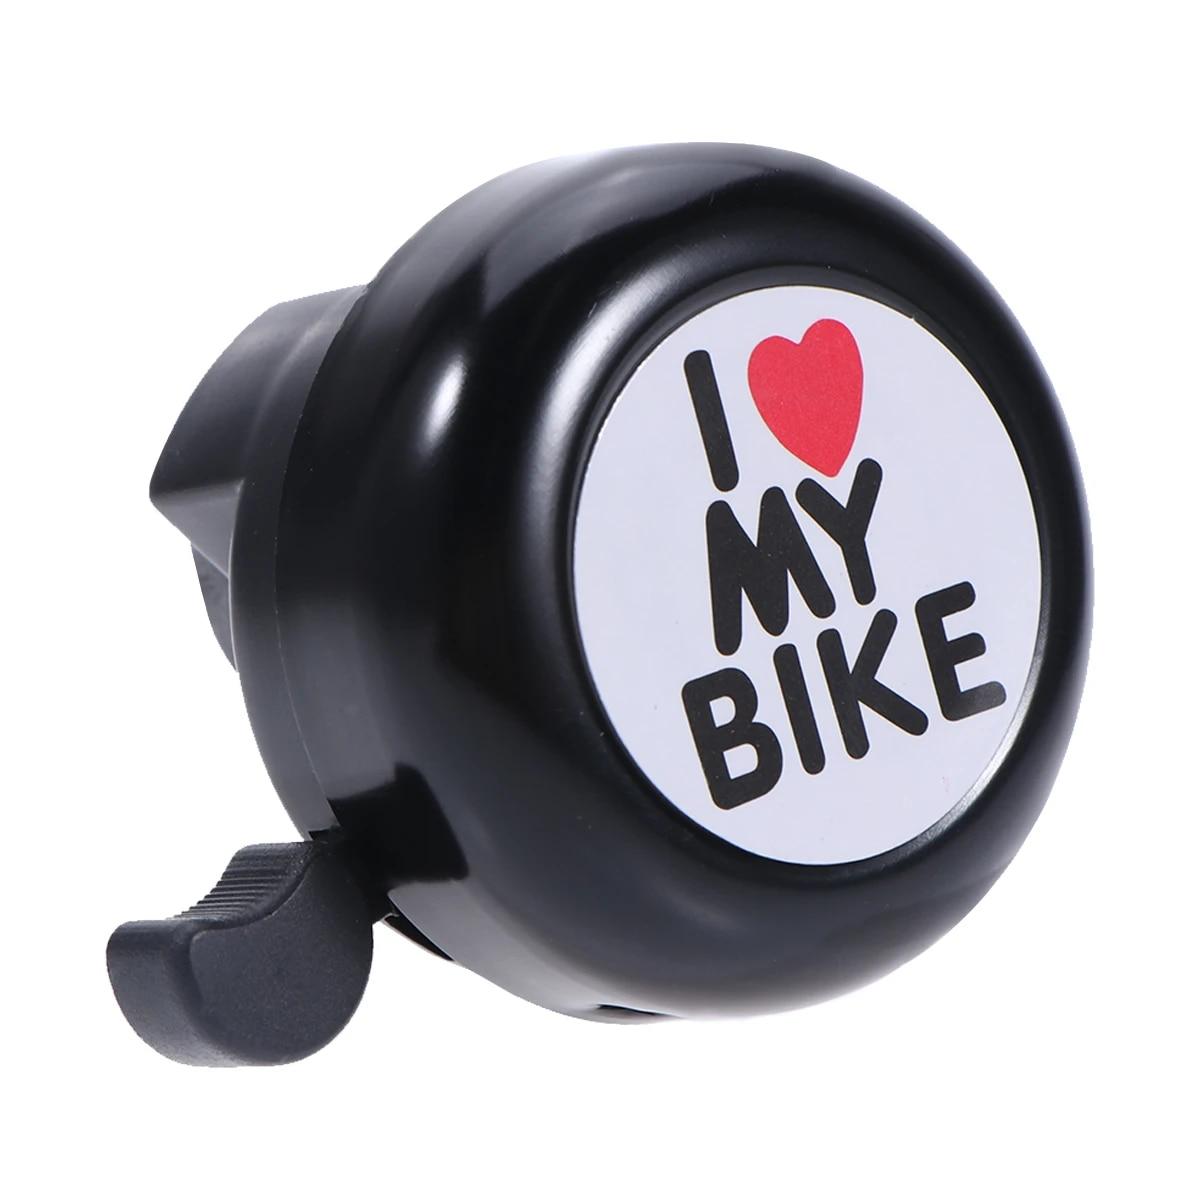 1X Cartoon Bike Bell Ring MTB Bicycle Handlebar Alarm H4T6 Brand Accessory T2T8